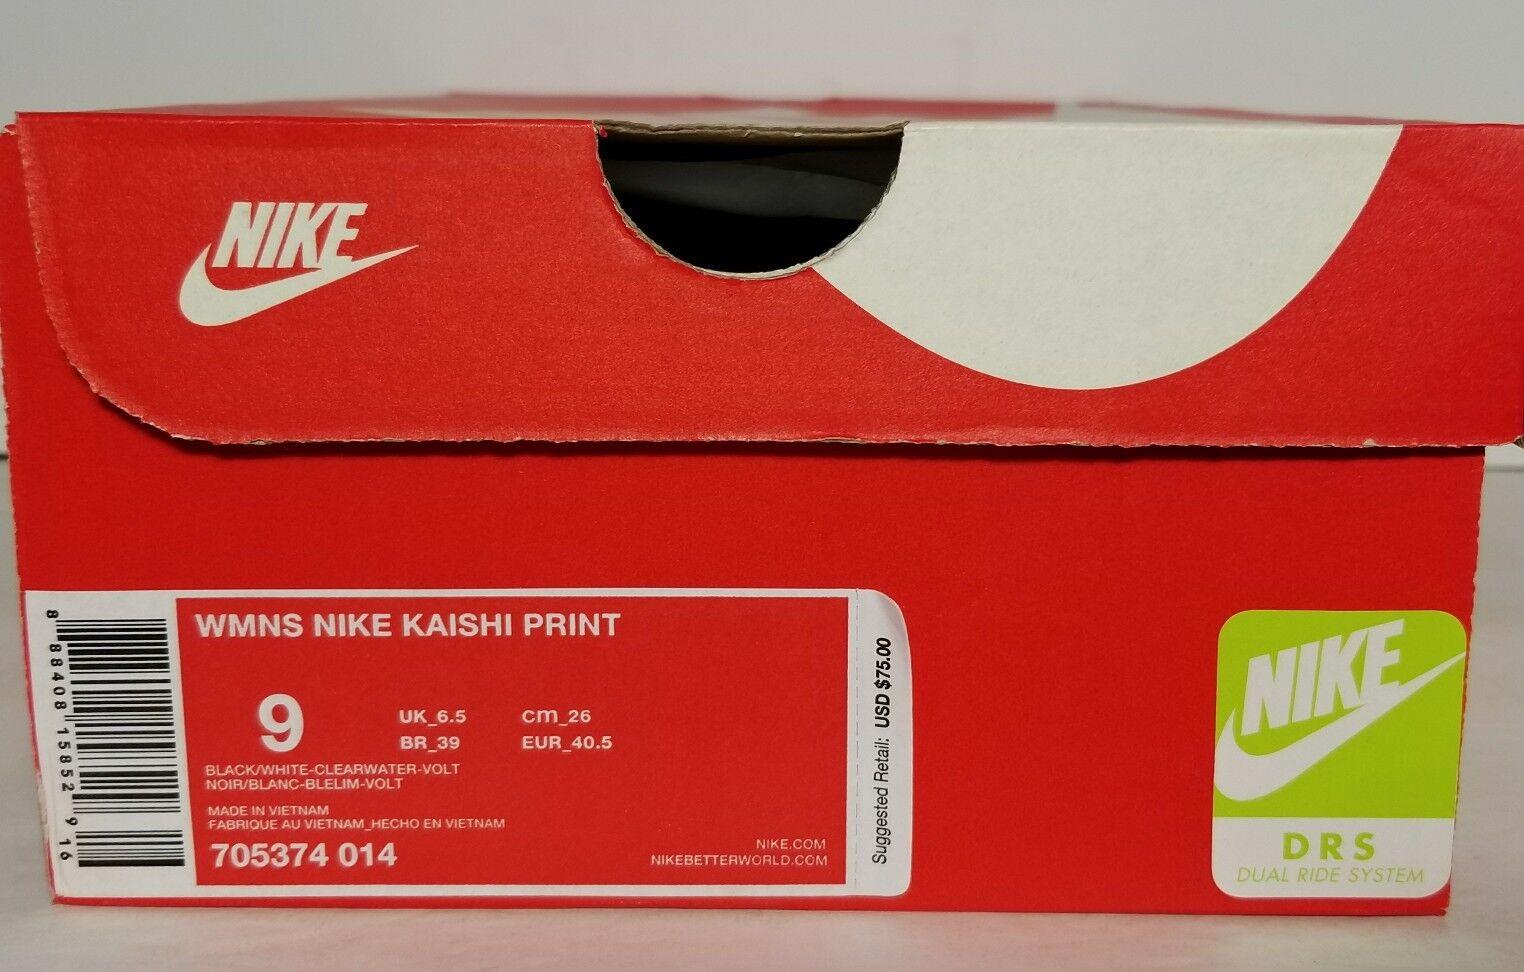 NIKE KAISHI PRINT WOMEN'S WOMEN'S WOMEN'S MULTIPLE SIZE NEW BOX 705374 014 0671bf